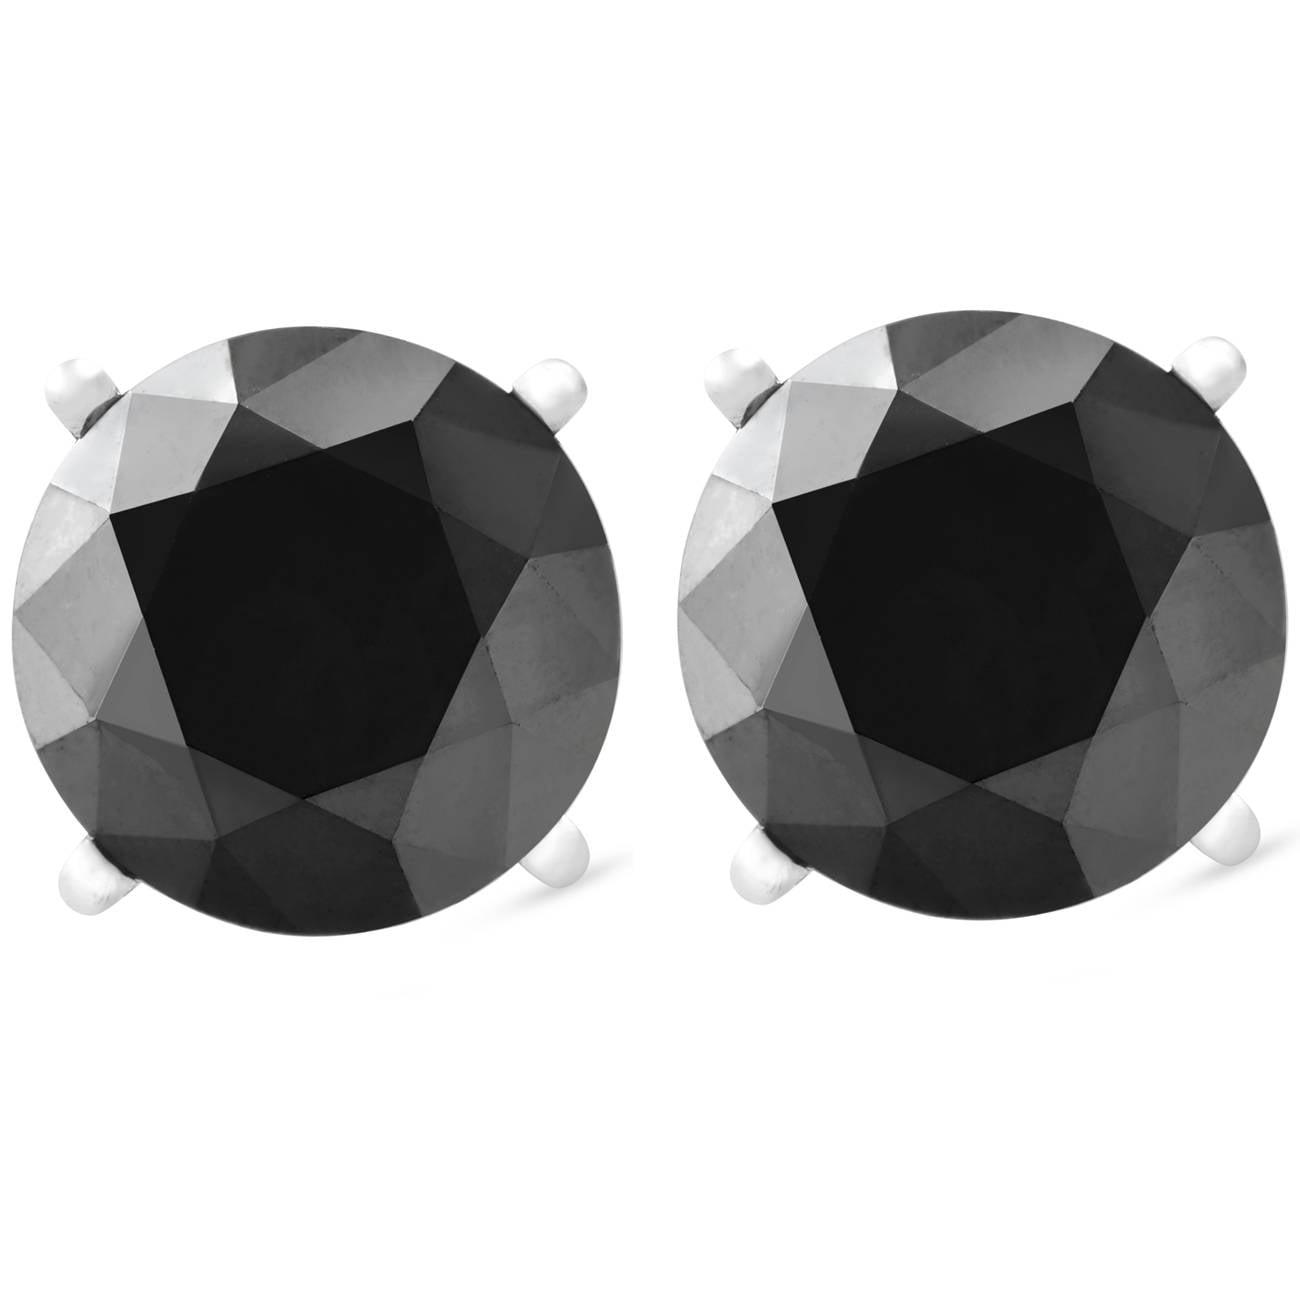 1ct Black Diamond Studs in 14k White Gold Heat Treated